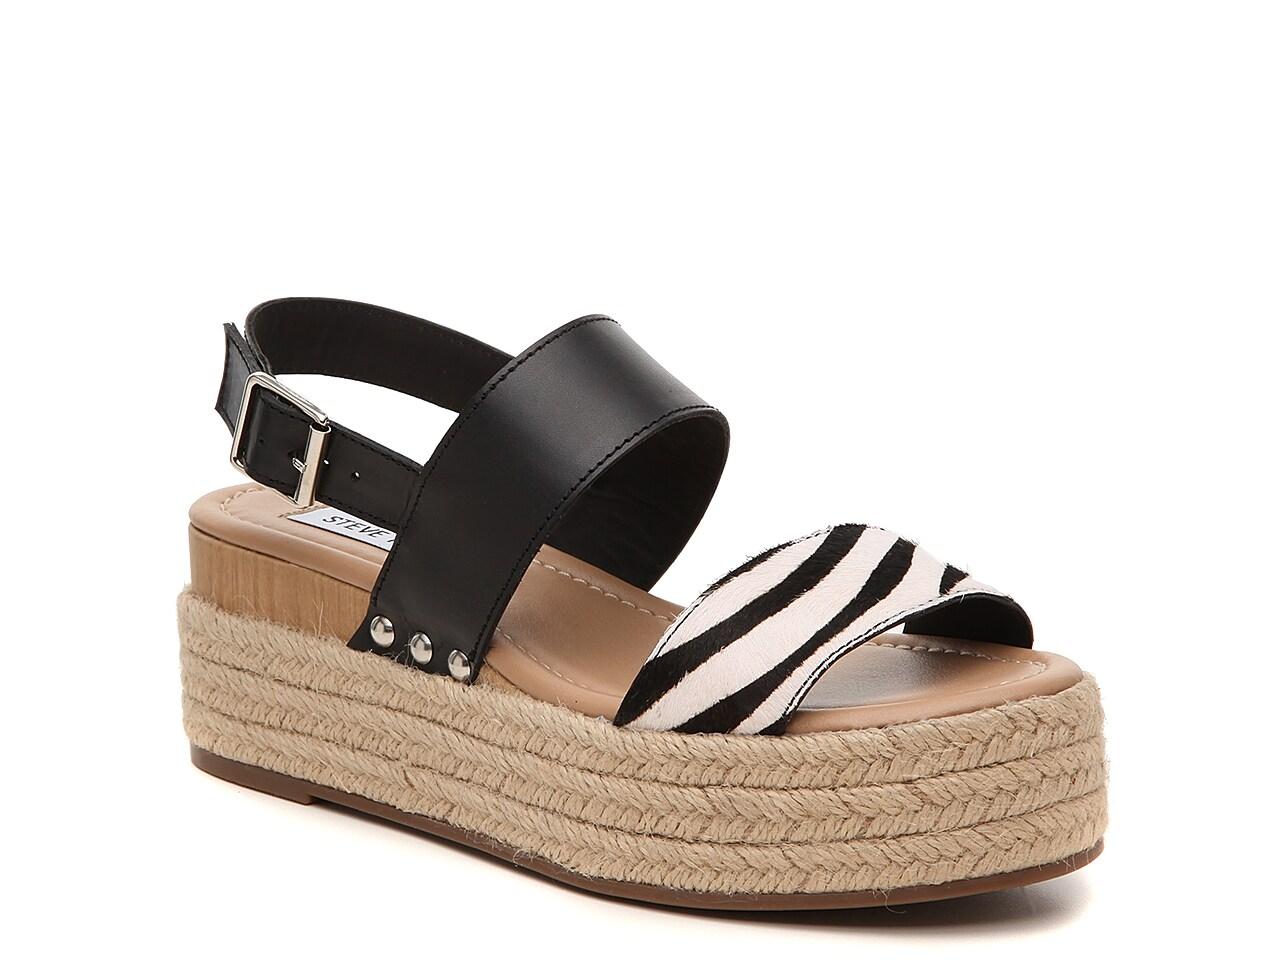 Fifer Espadrille Wedge Sandal